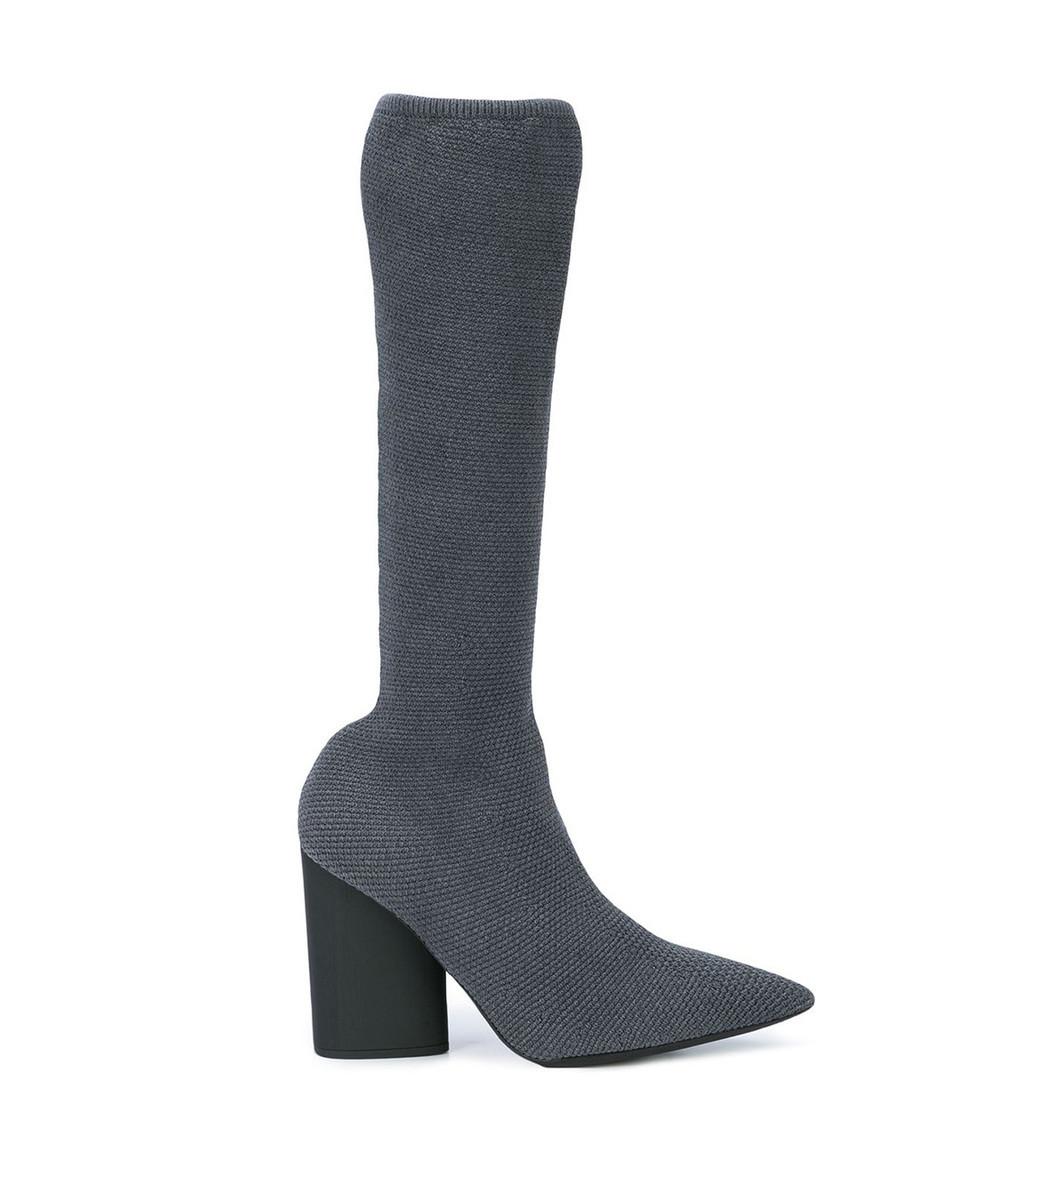 Grey Knit Stretch Boot